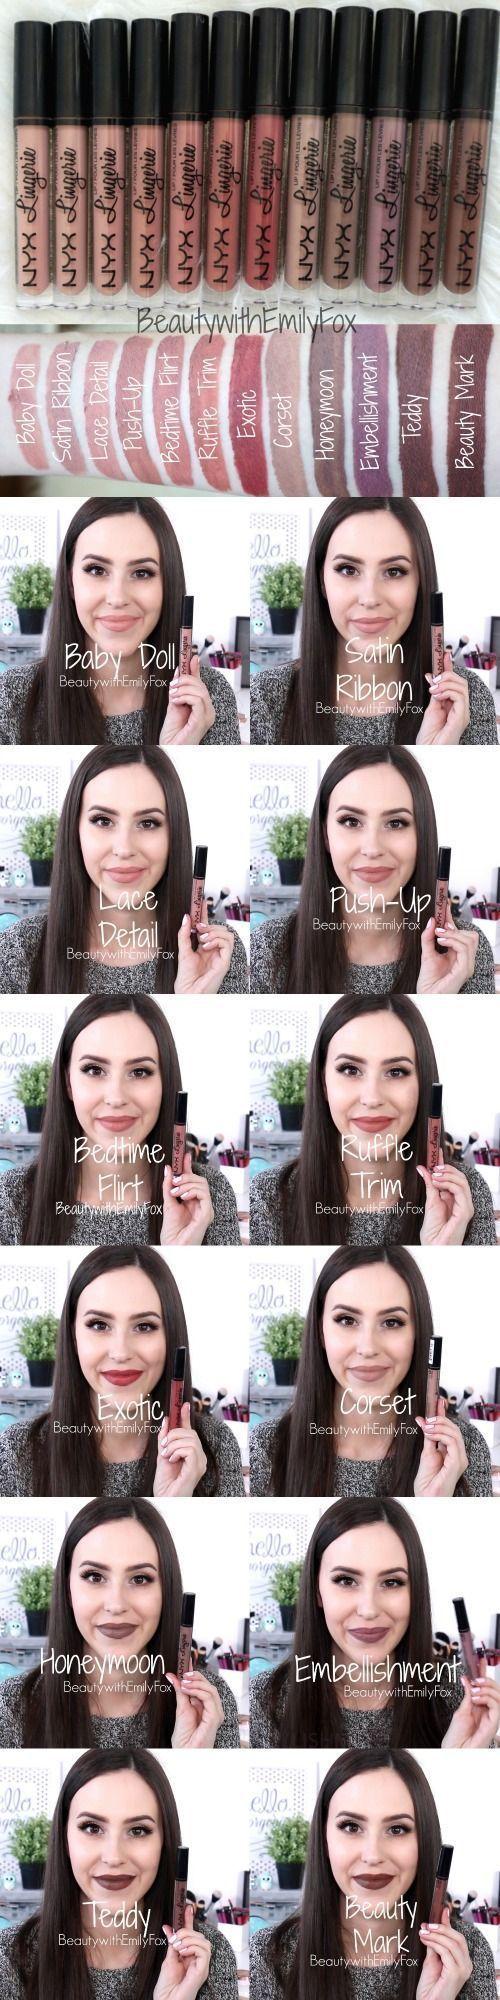 NYX Lingerie Liquid Lipstick Swatches - Baby Doll, Satin Ribbon, Lace Detail, Push-Up, Bedtime Flirt, Ruffle Trim, Exotic, Corset, Honeymoon, Embellishment, Teddy and Beauty Mark